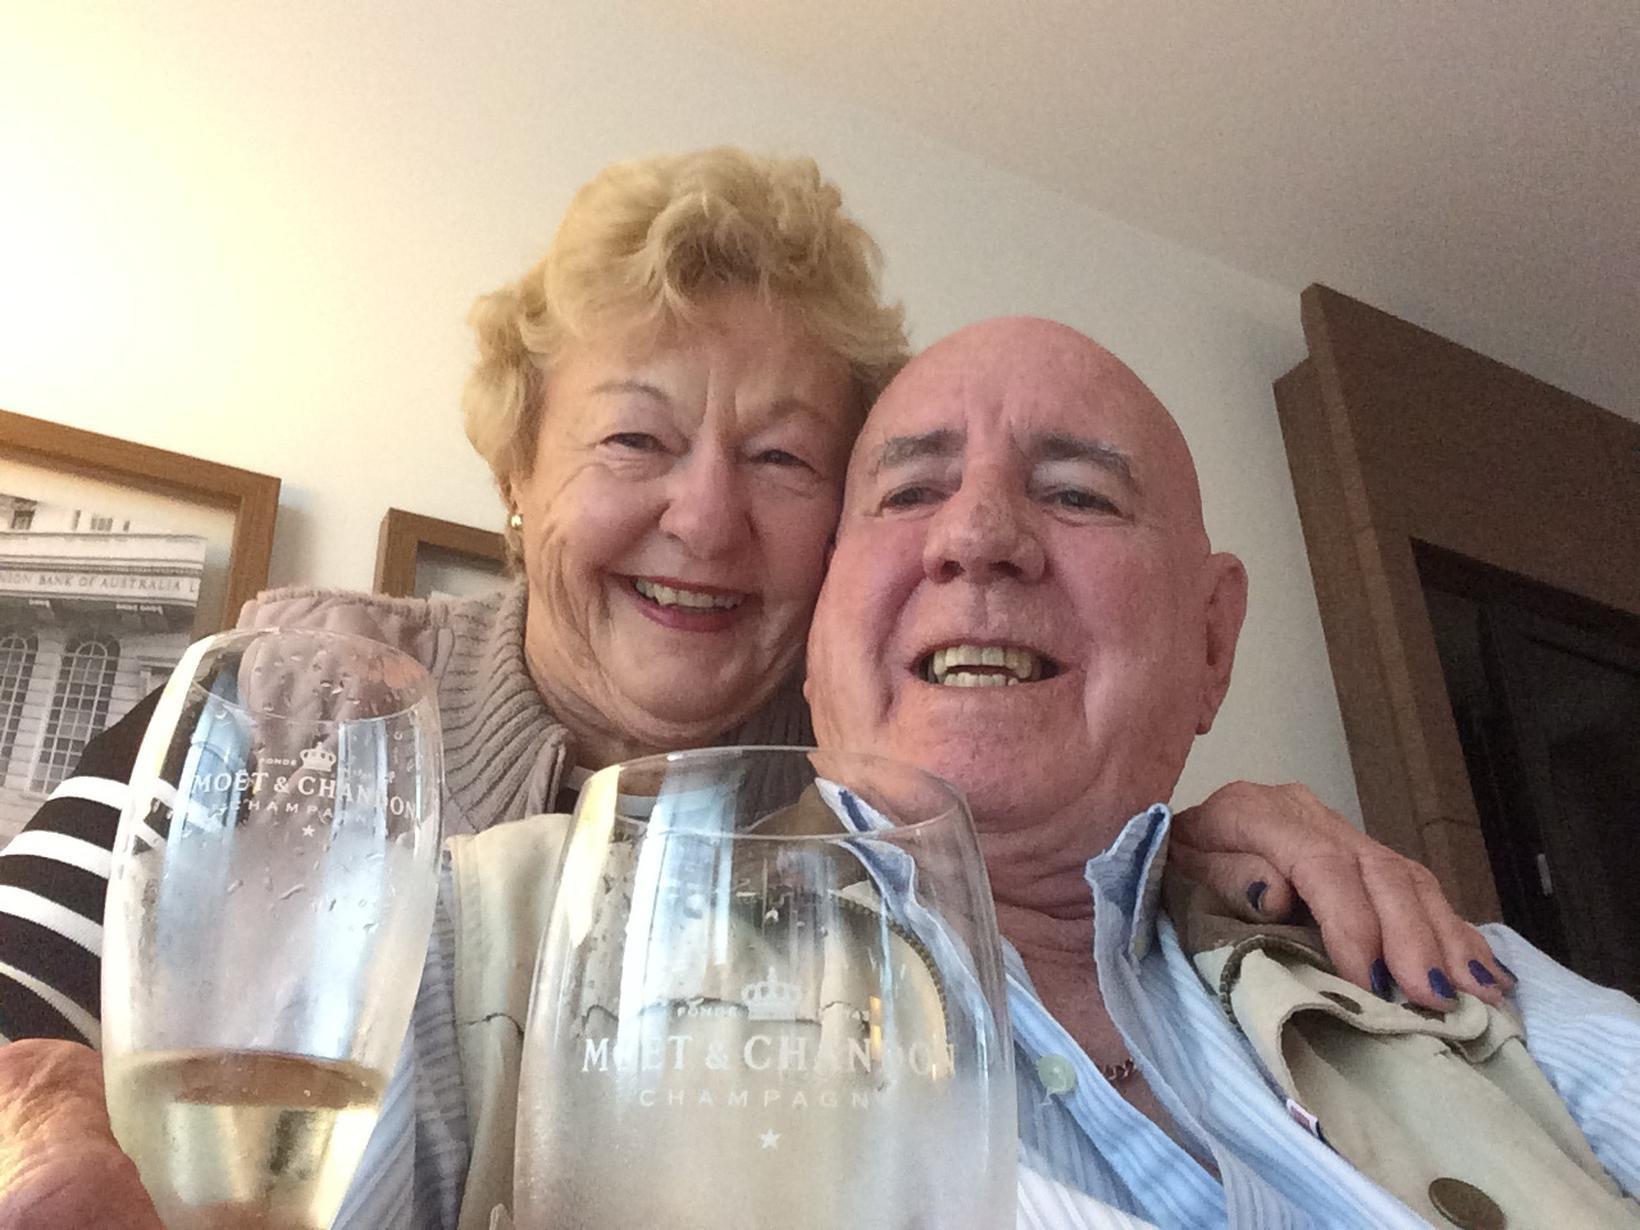 John & Marcia from Gold Coast, Queensland, Australia